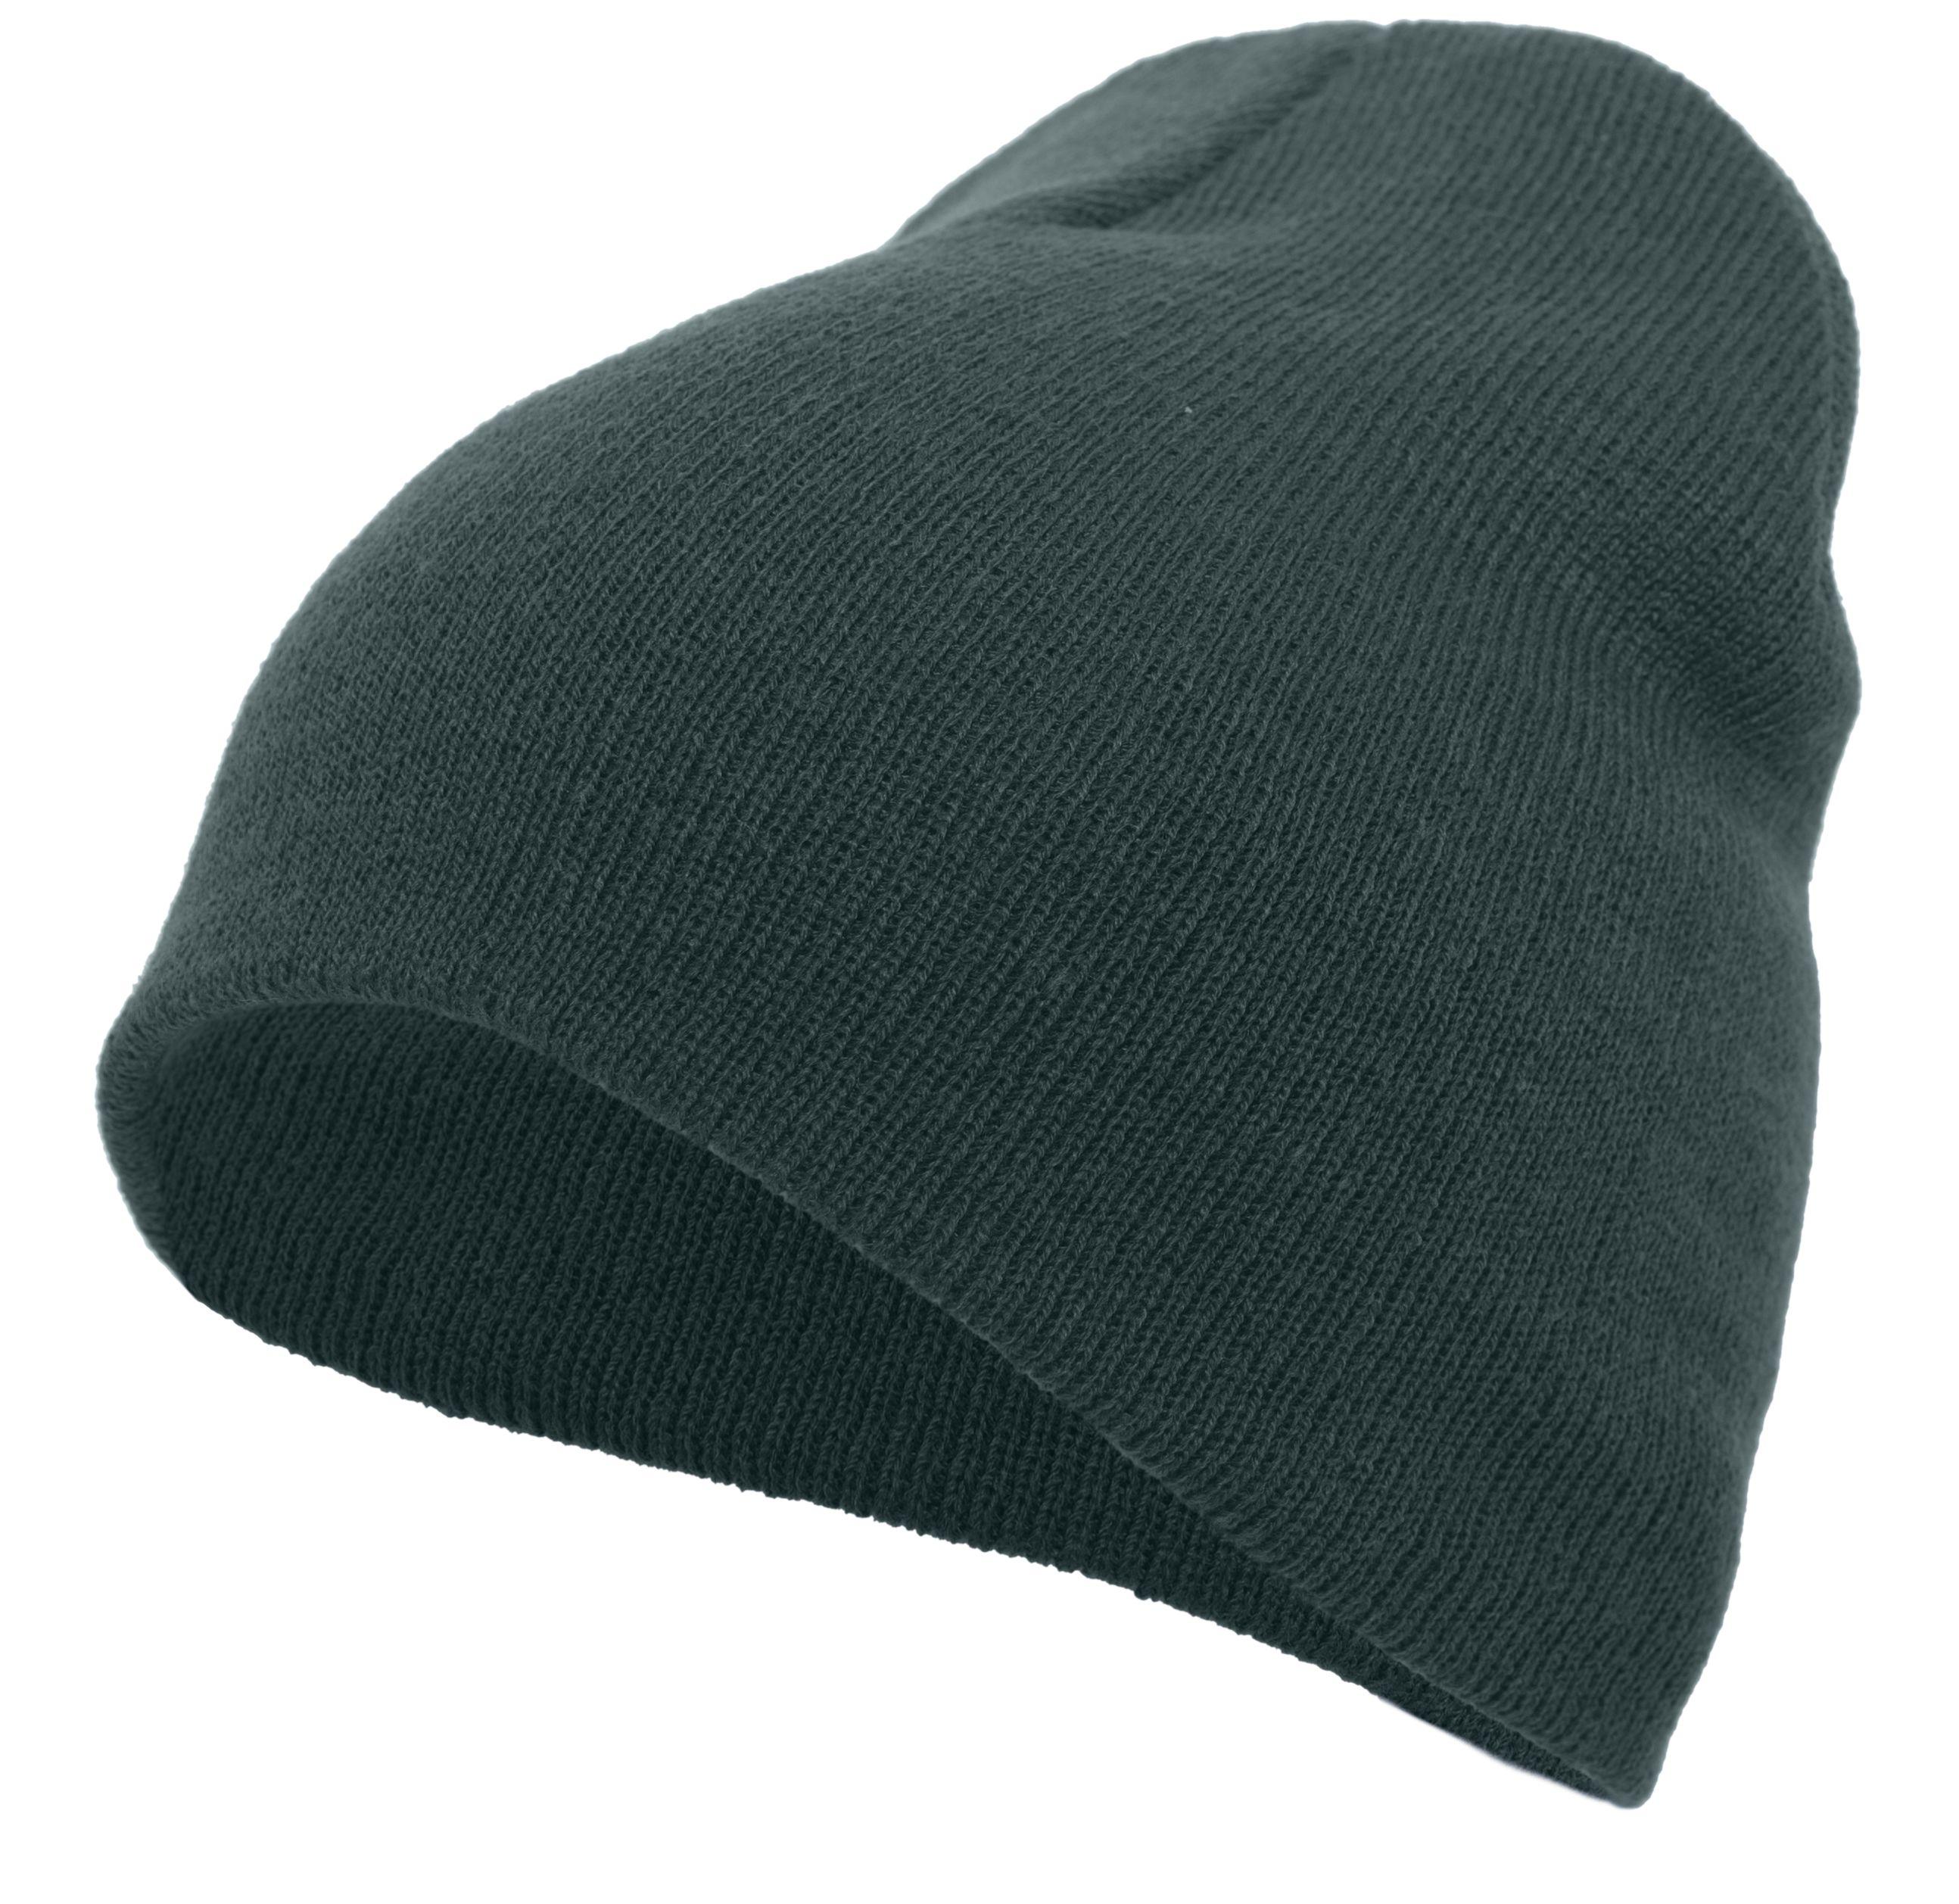 Basic Knit Beanie - DARK GREEN